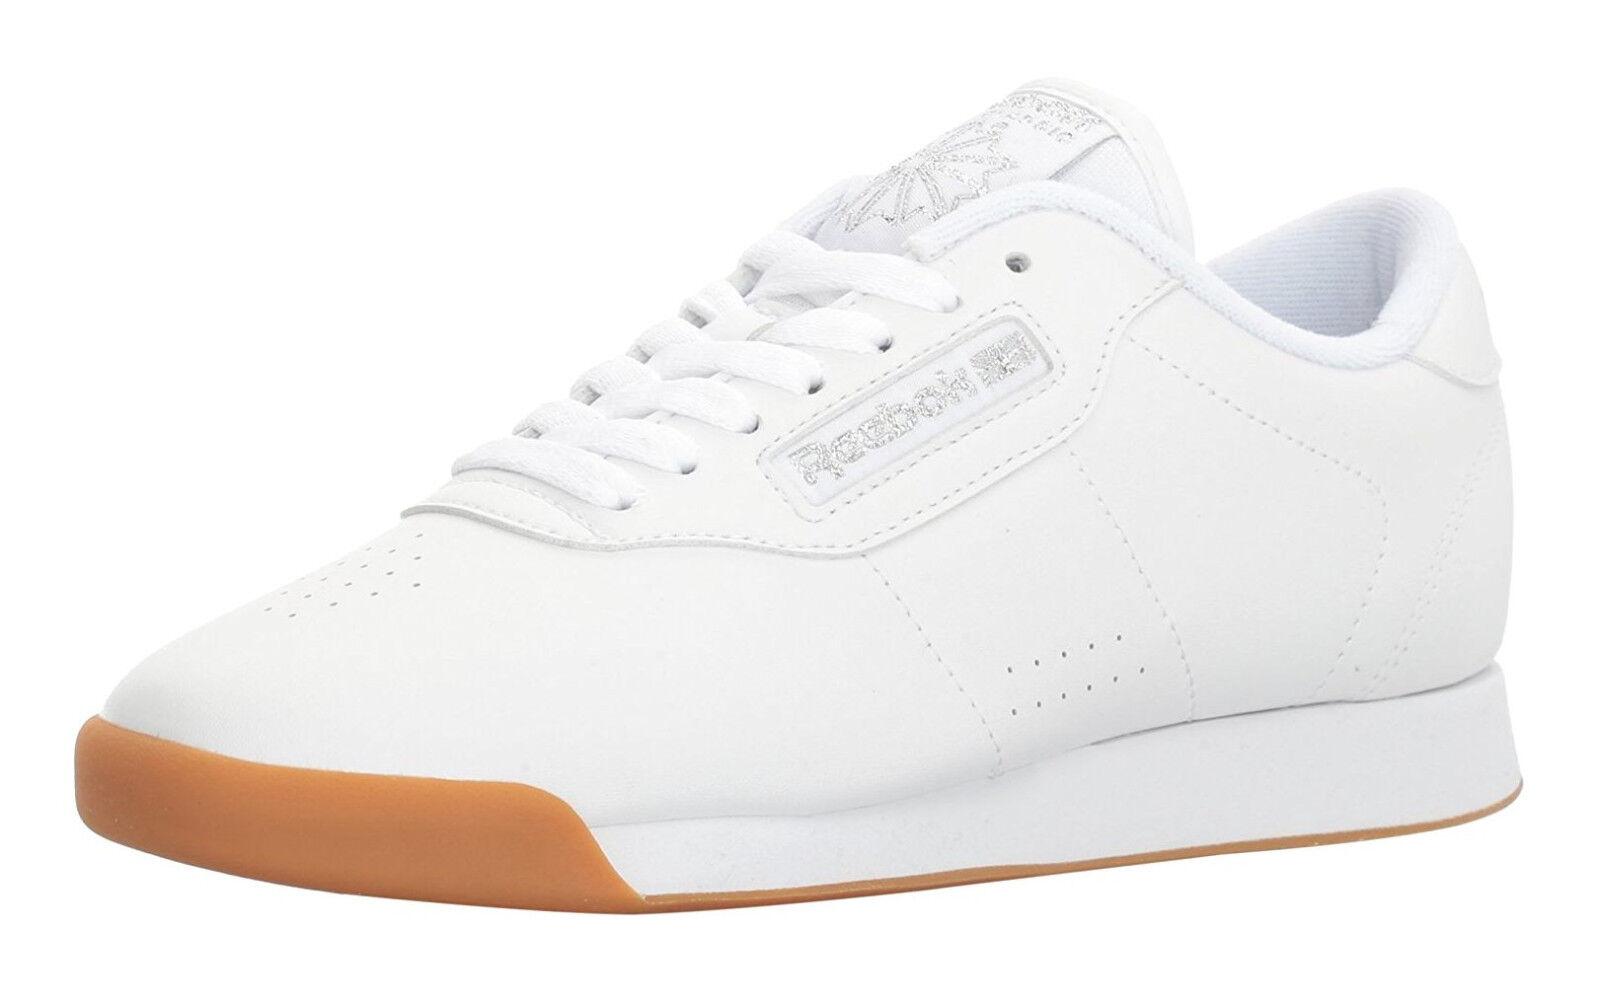 Reebok Classic Princess White Gum Womens Running Tennis Shoes